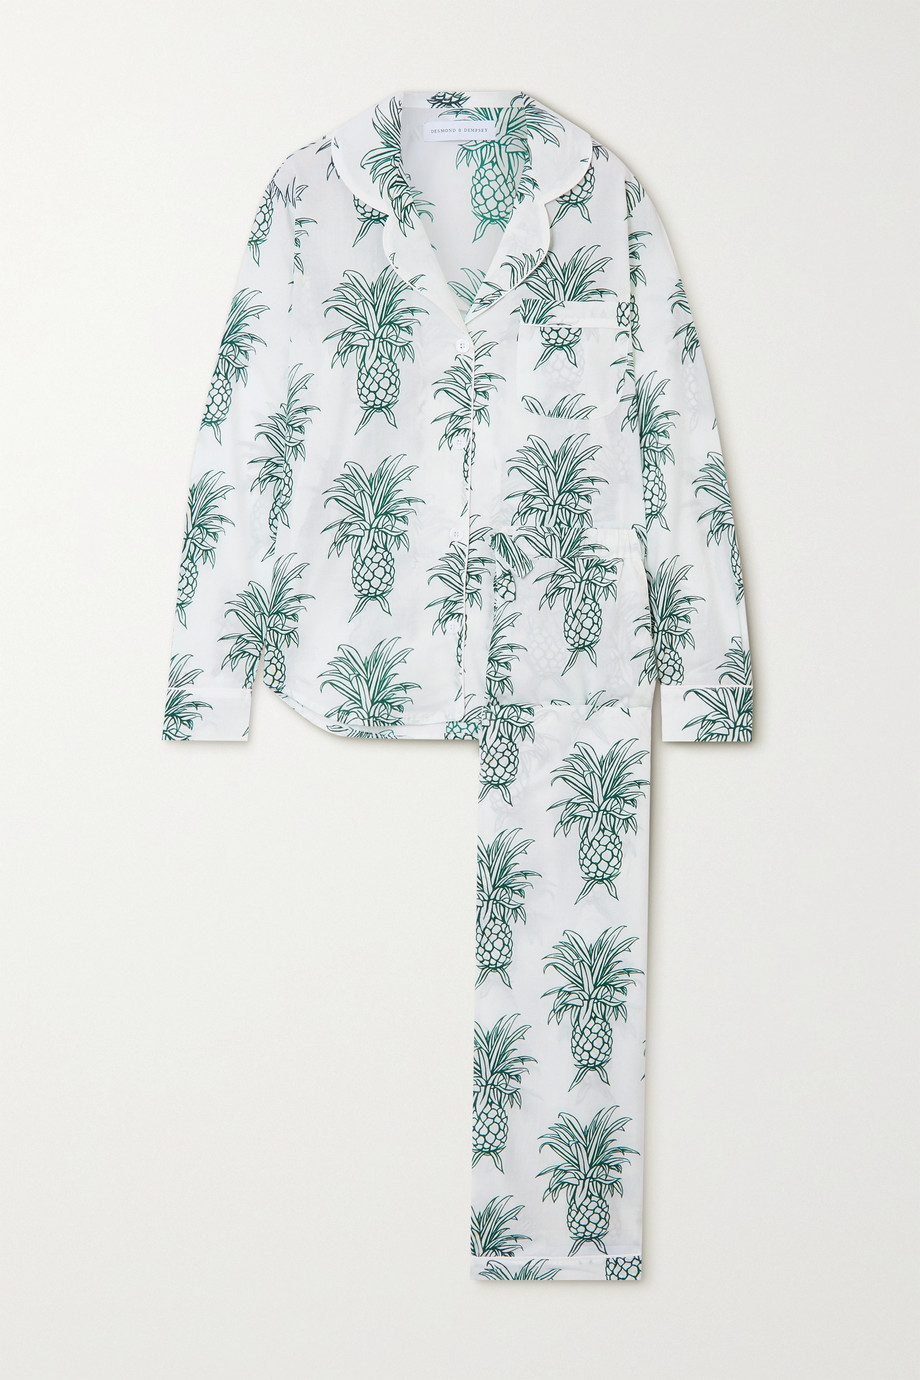 Desmond & Dempsey Pyjama en coton biologique imprimé Howie